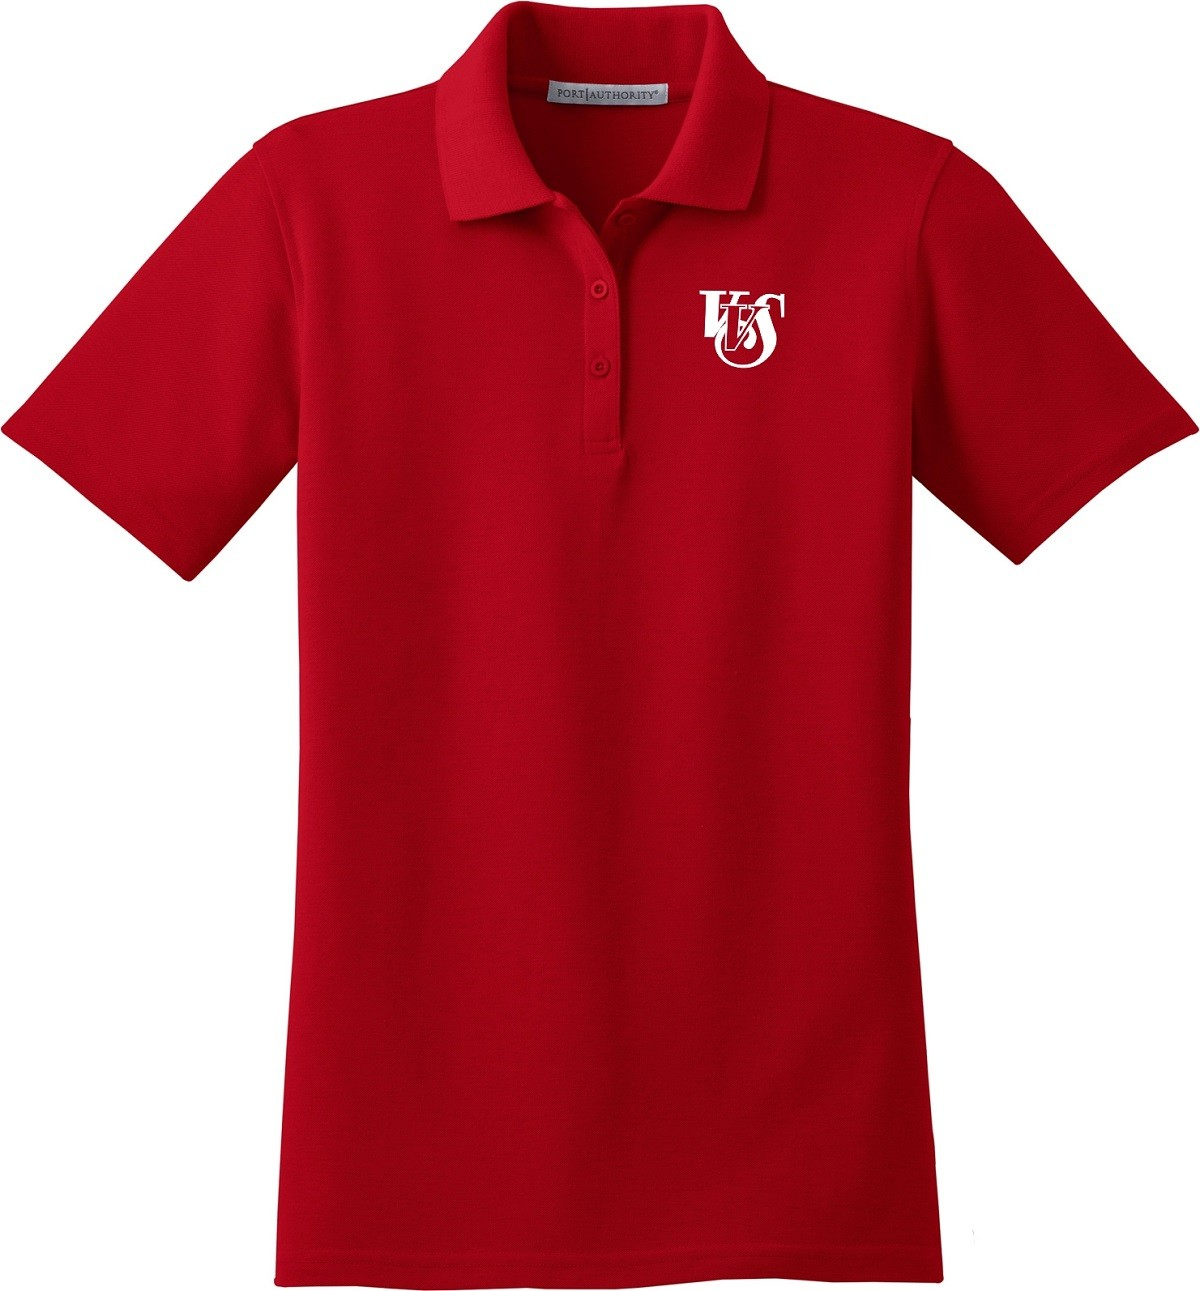 VVS DryBlend Polo Shirt